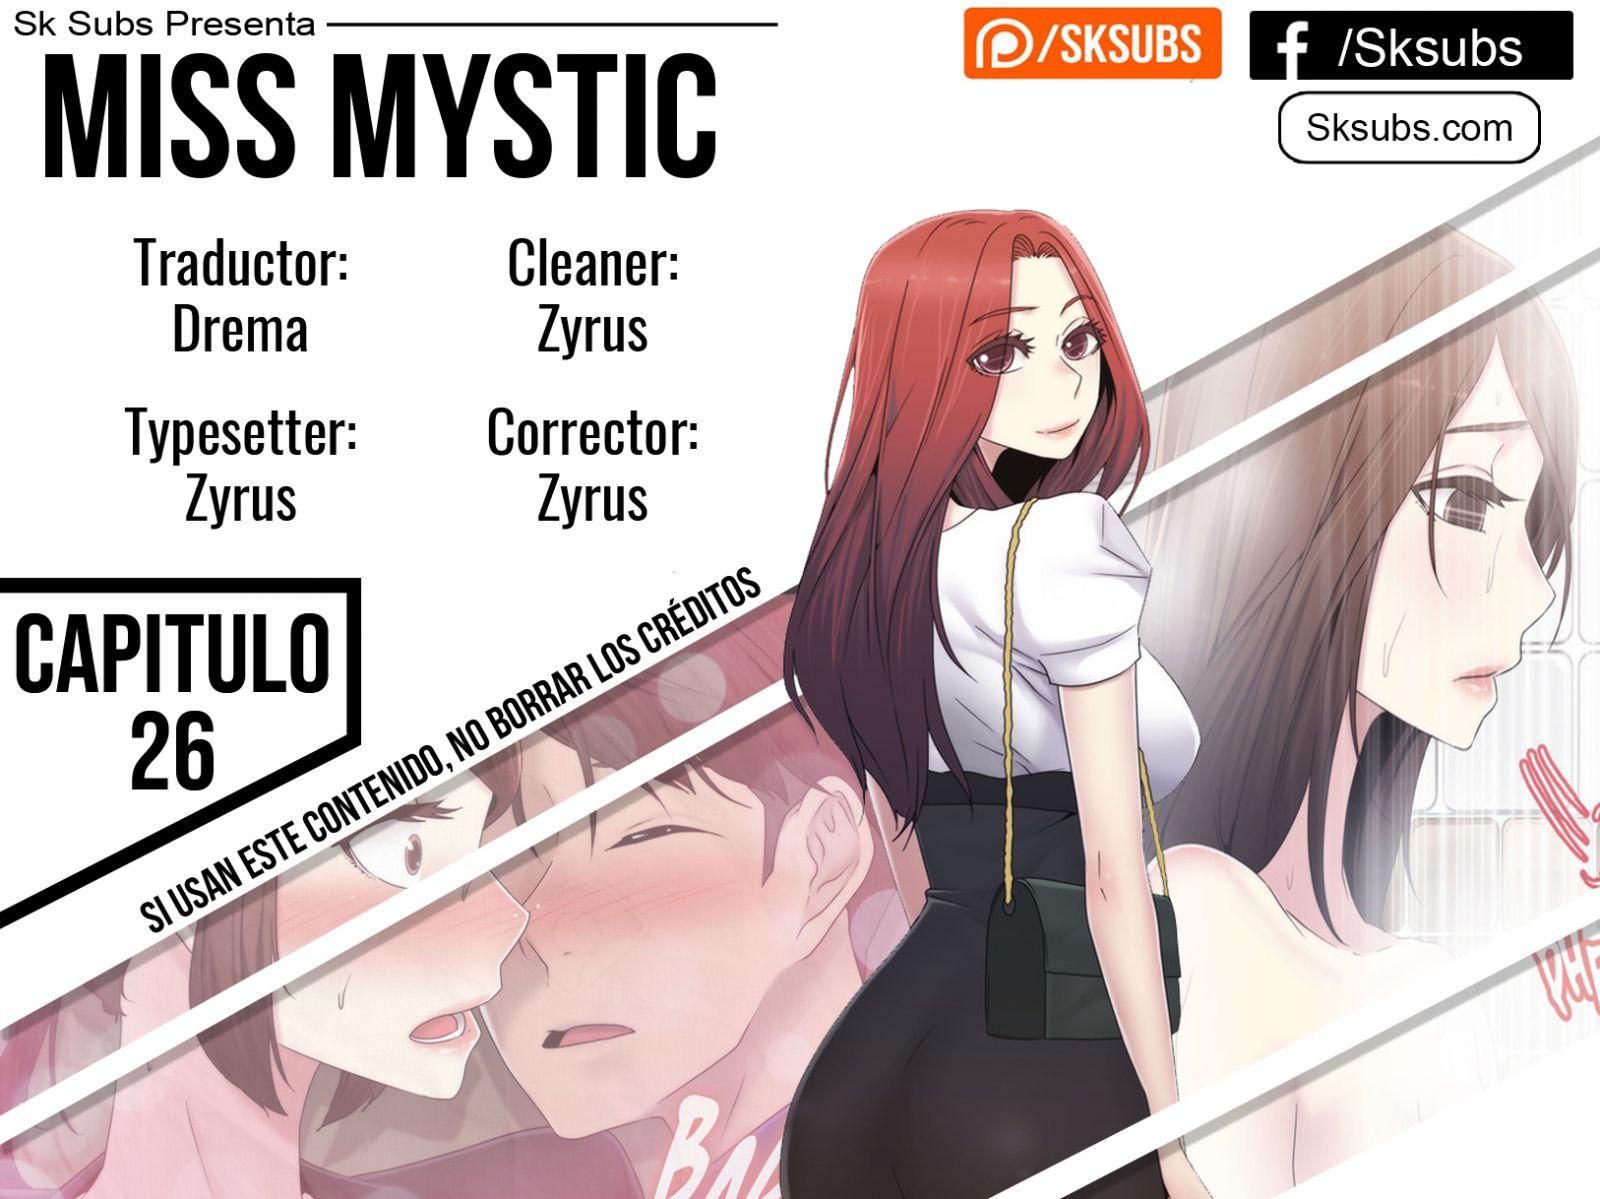 https://c9.mangatag.com/es_manga/pic5/24/20248/644935/af9370965df770606185339c69f1b751.jpg Page 1